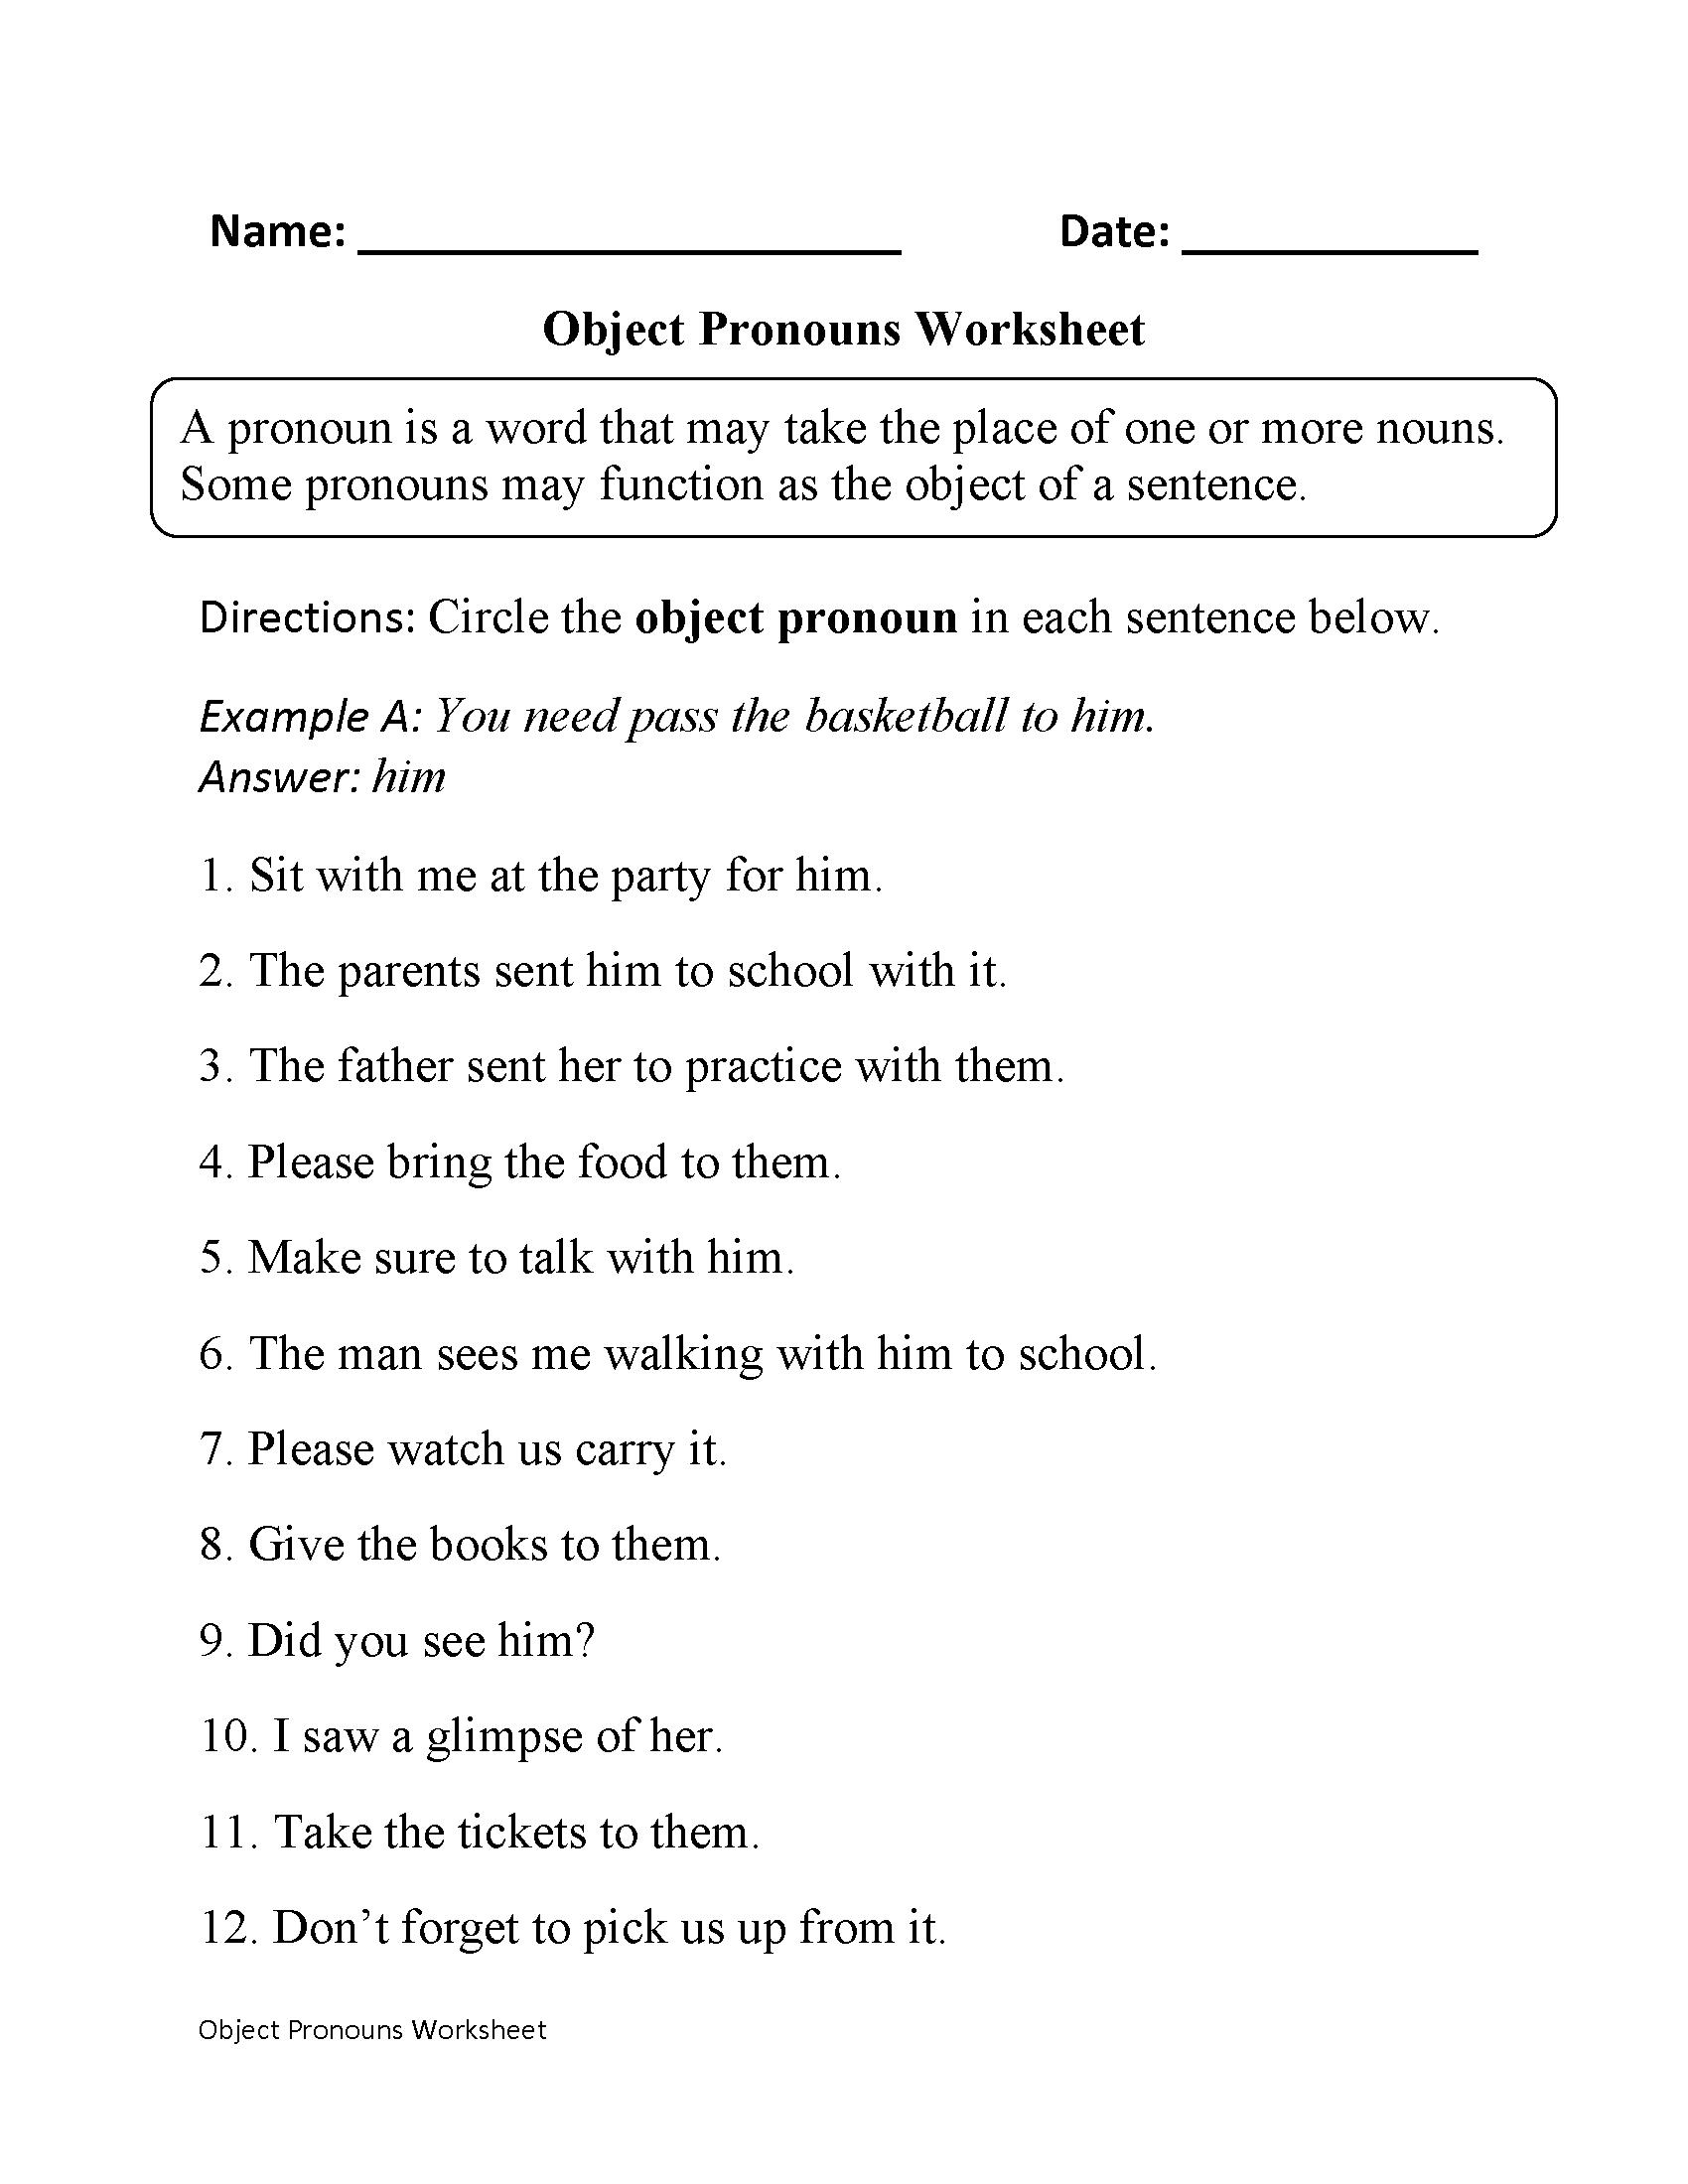 Pronoun Worksheets 6th Grade